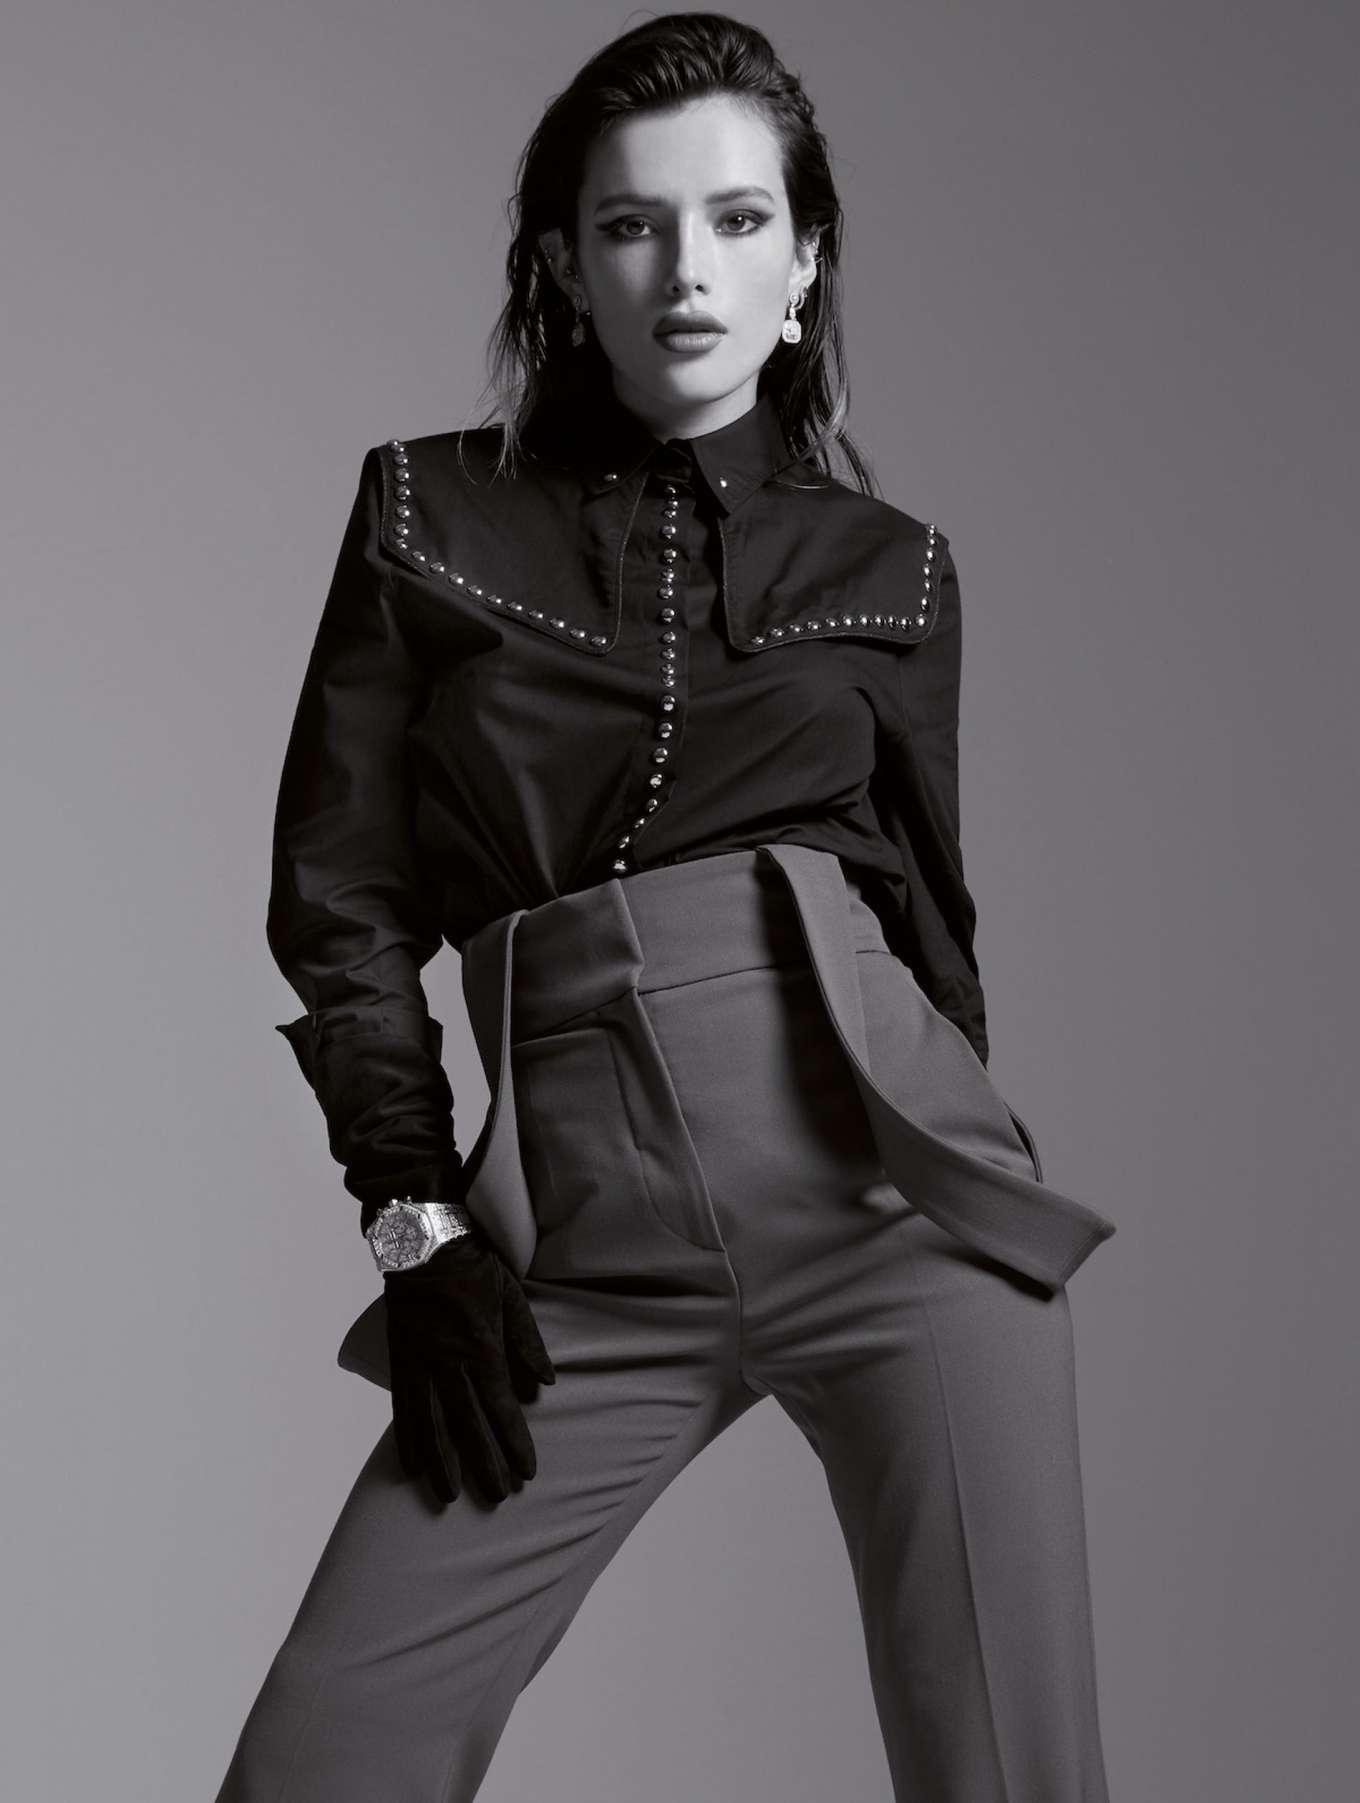 Bella Thorne for L'officiel Italy Magazine (September 2019)